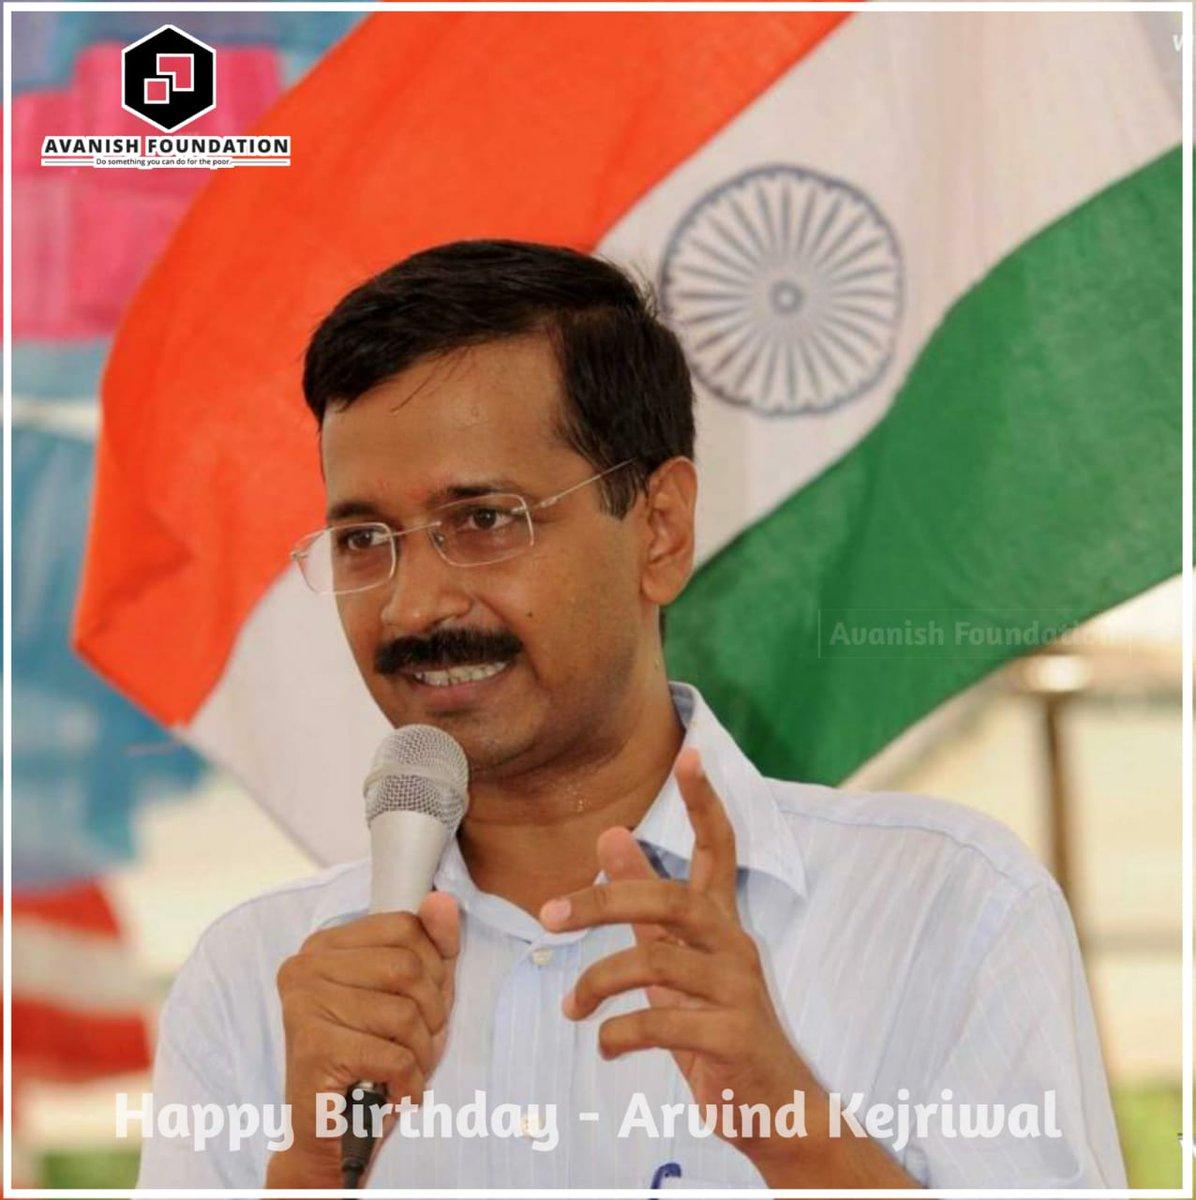 #HappyBirthdayAK Happy Birthday @ArvindKejriwal sir https://t.co/IphOyFQDQ4